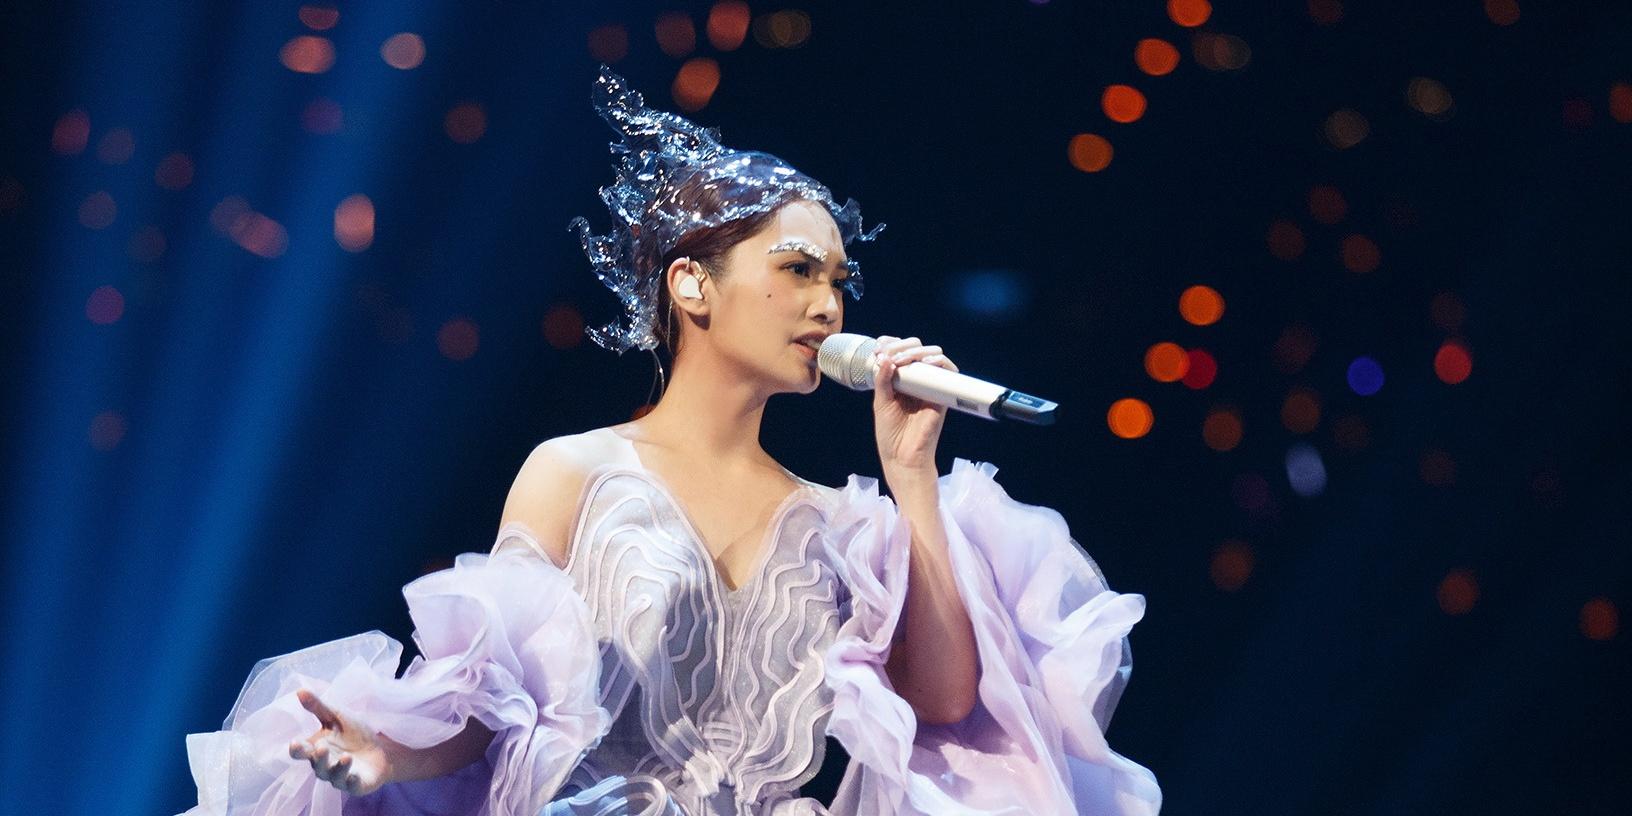 BREAKING: Rainie Yang to perform in Singapore this November